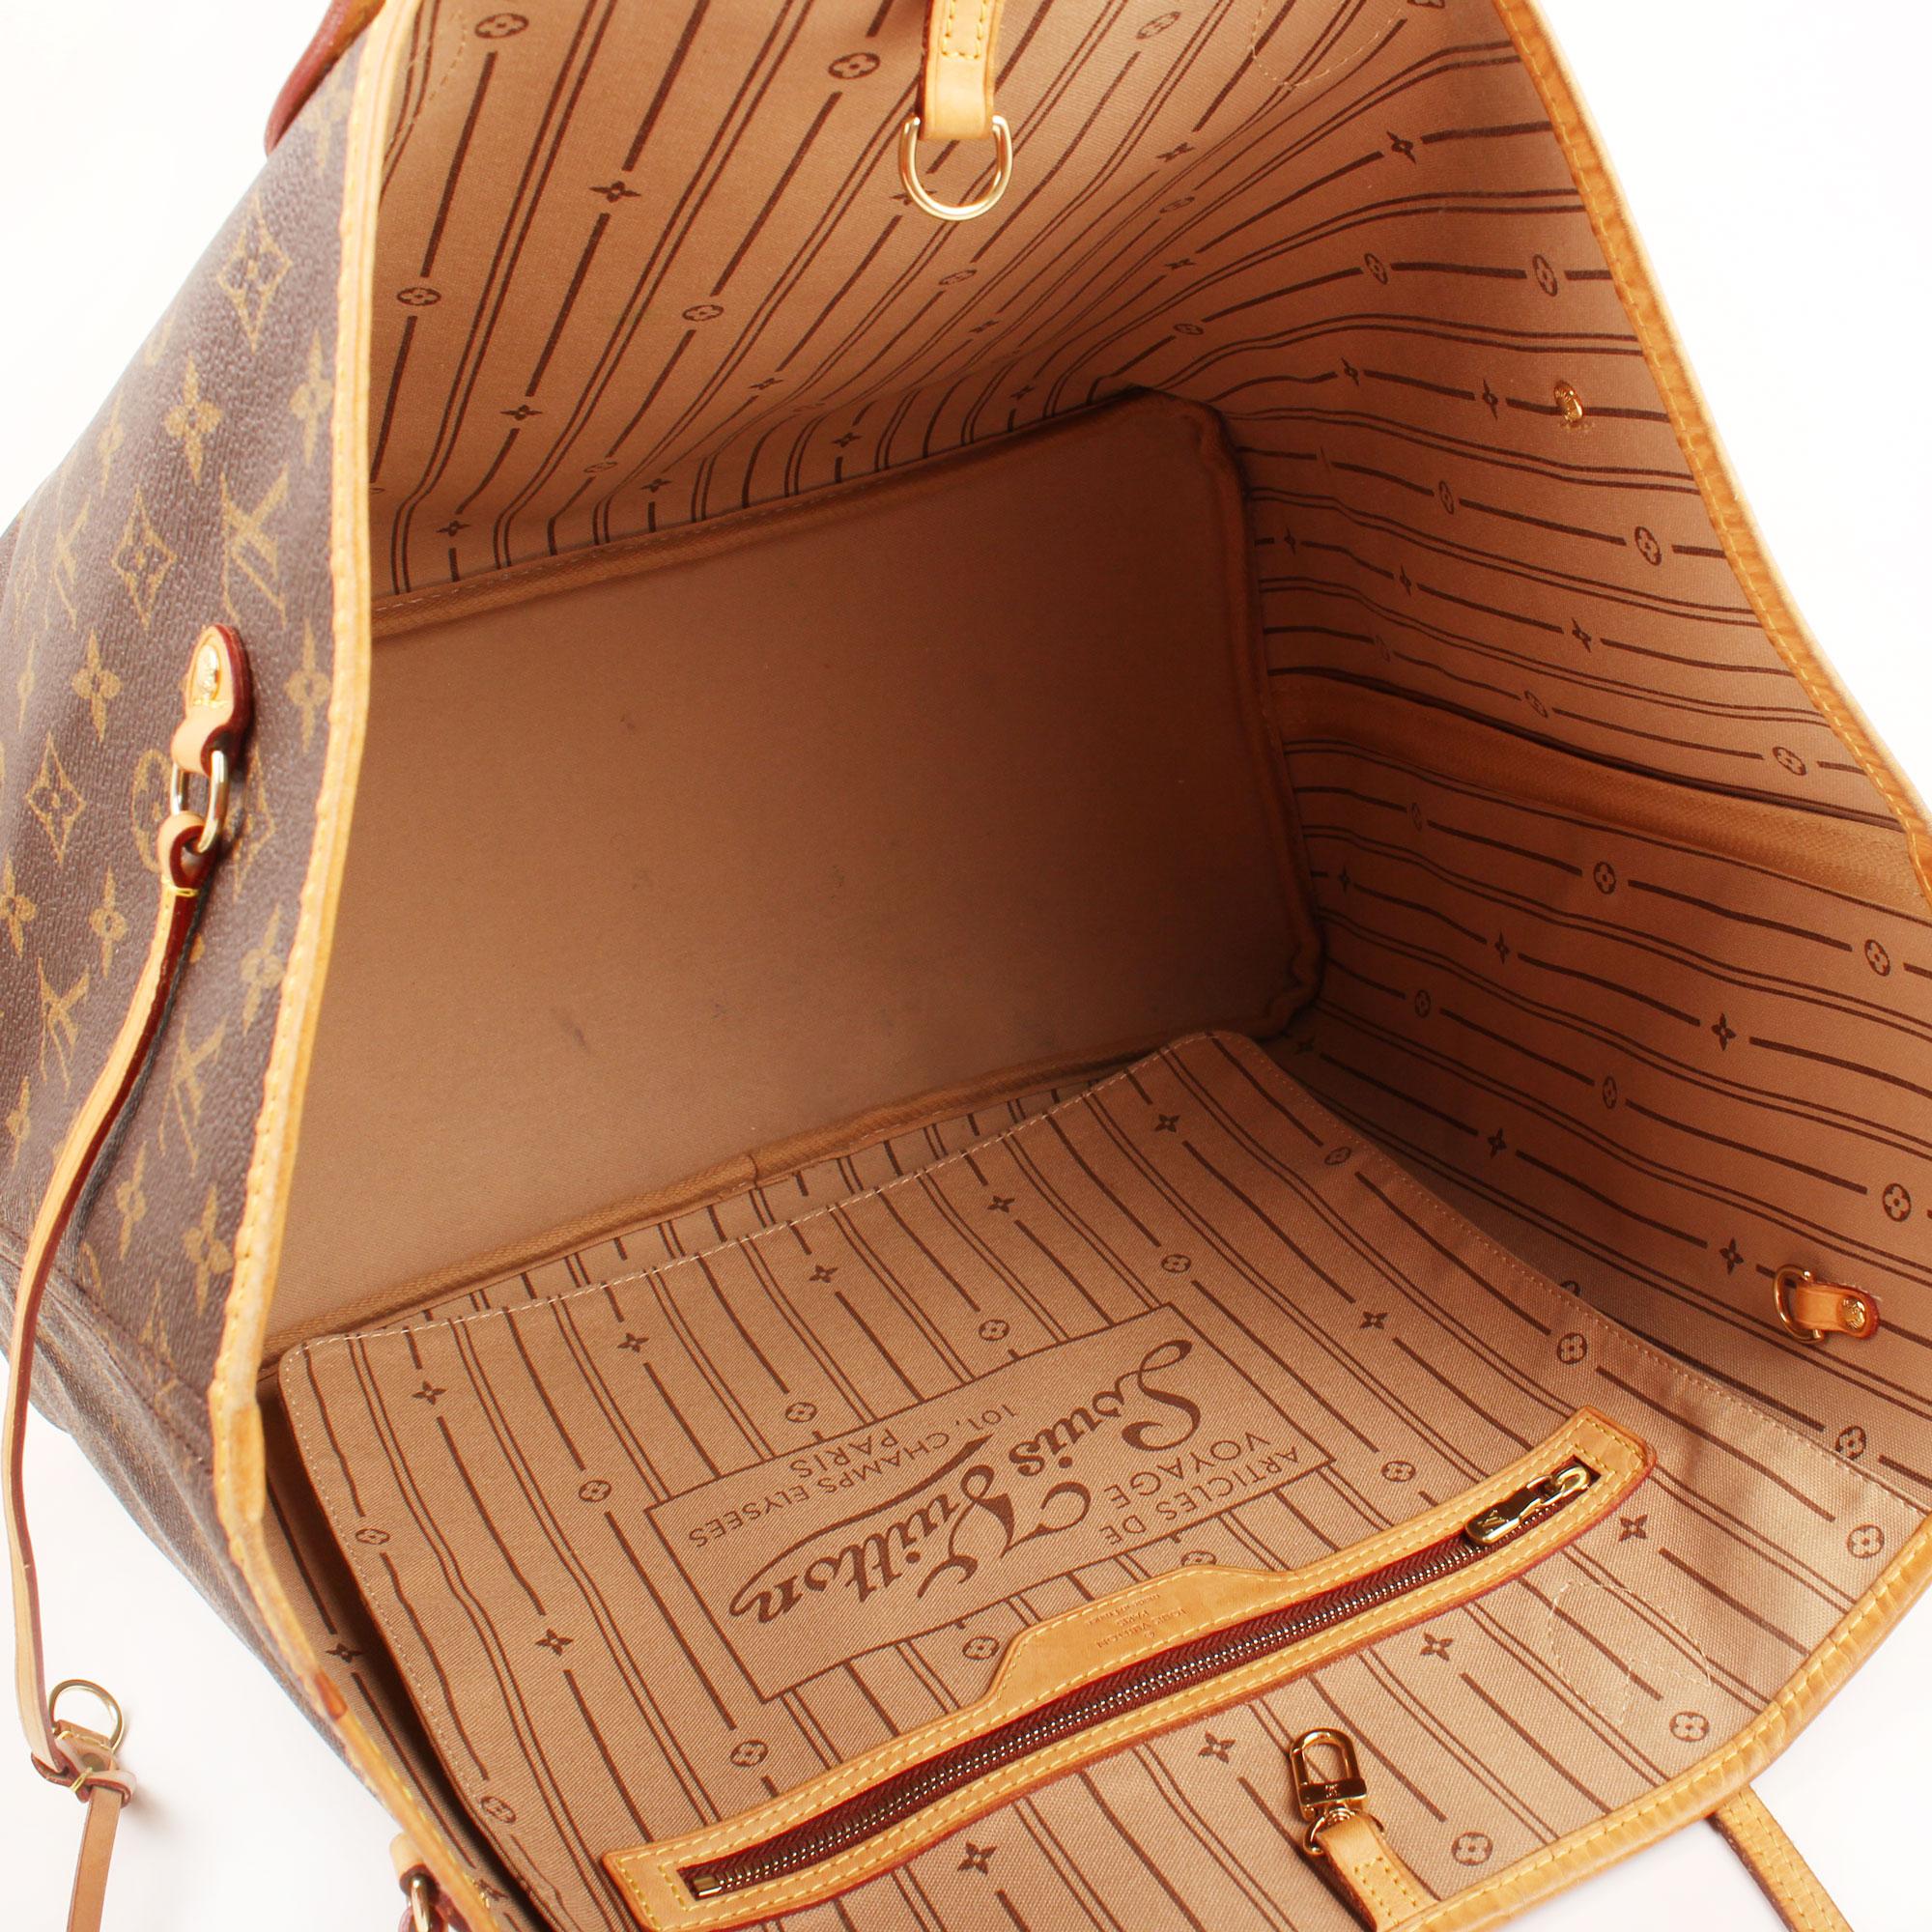 Interior image of louis vuitton neverfull gm bag monogram